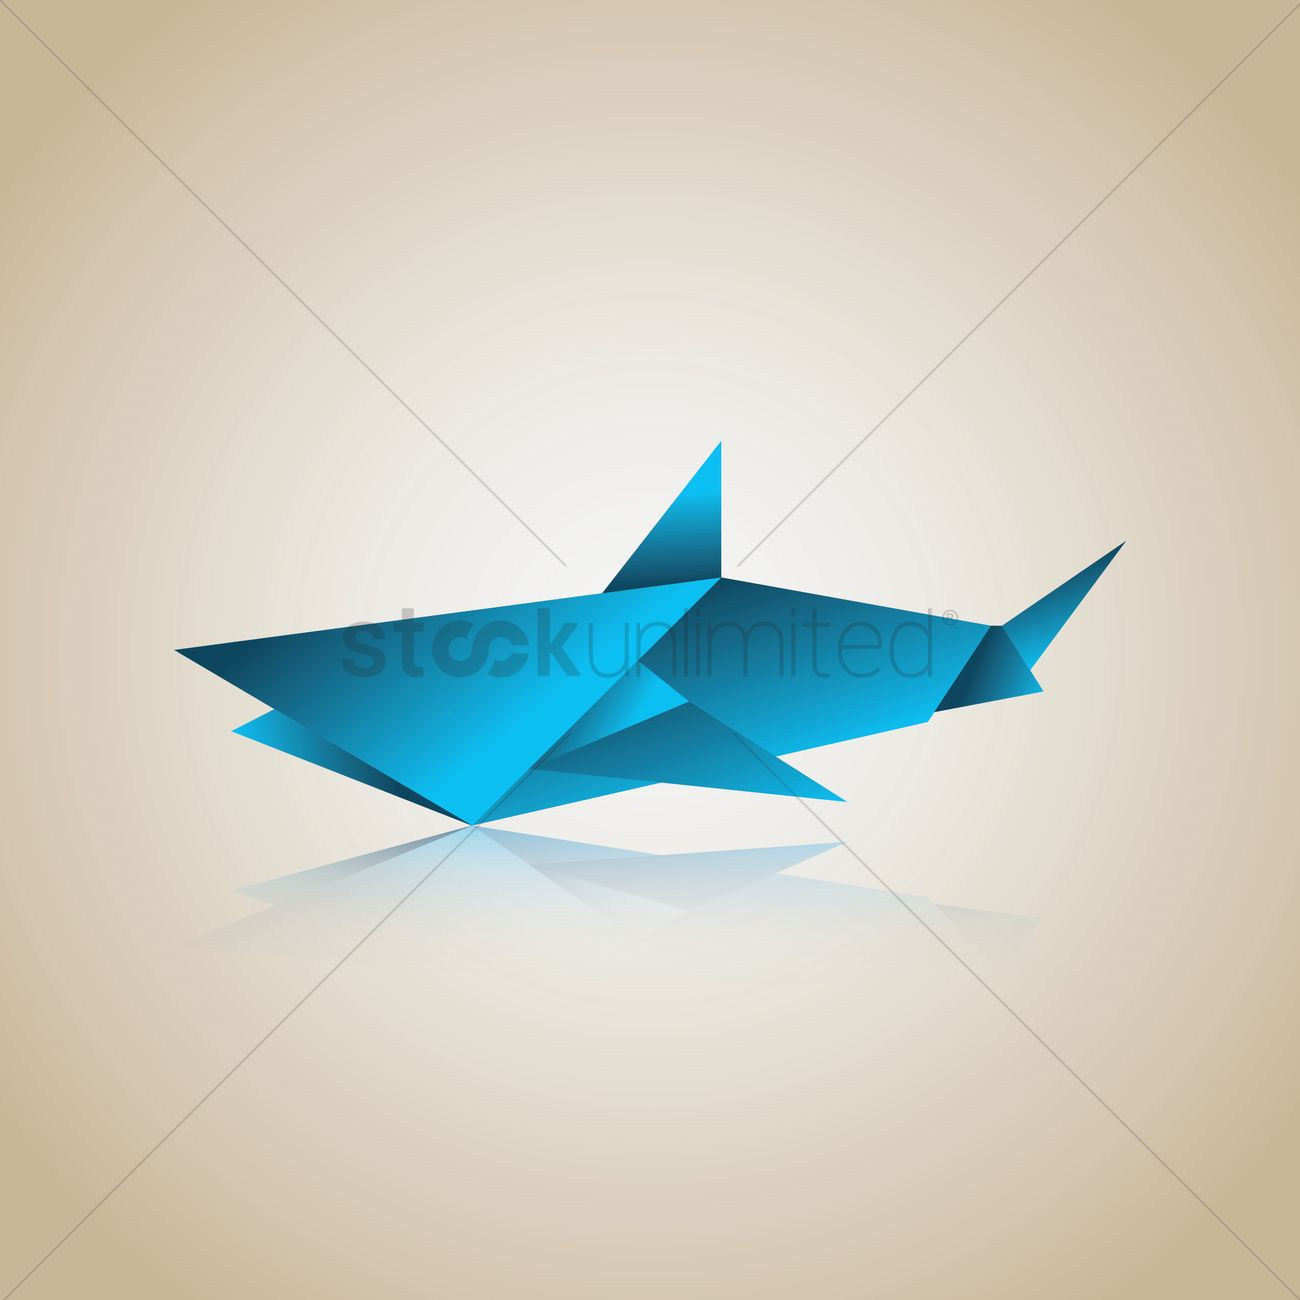 Free Origami Shark Vector Image 1482068 Stockunlimited